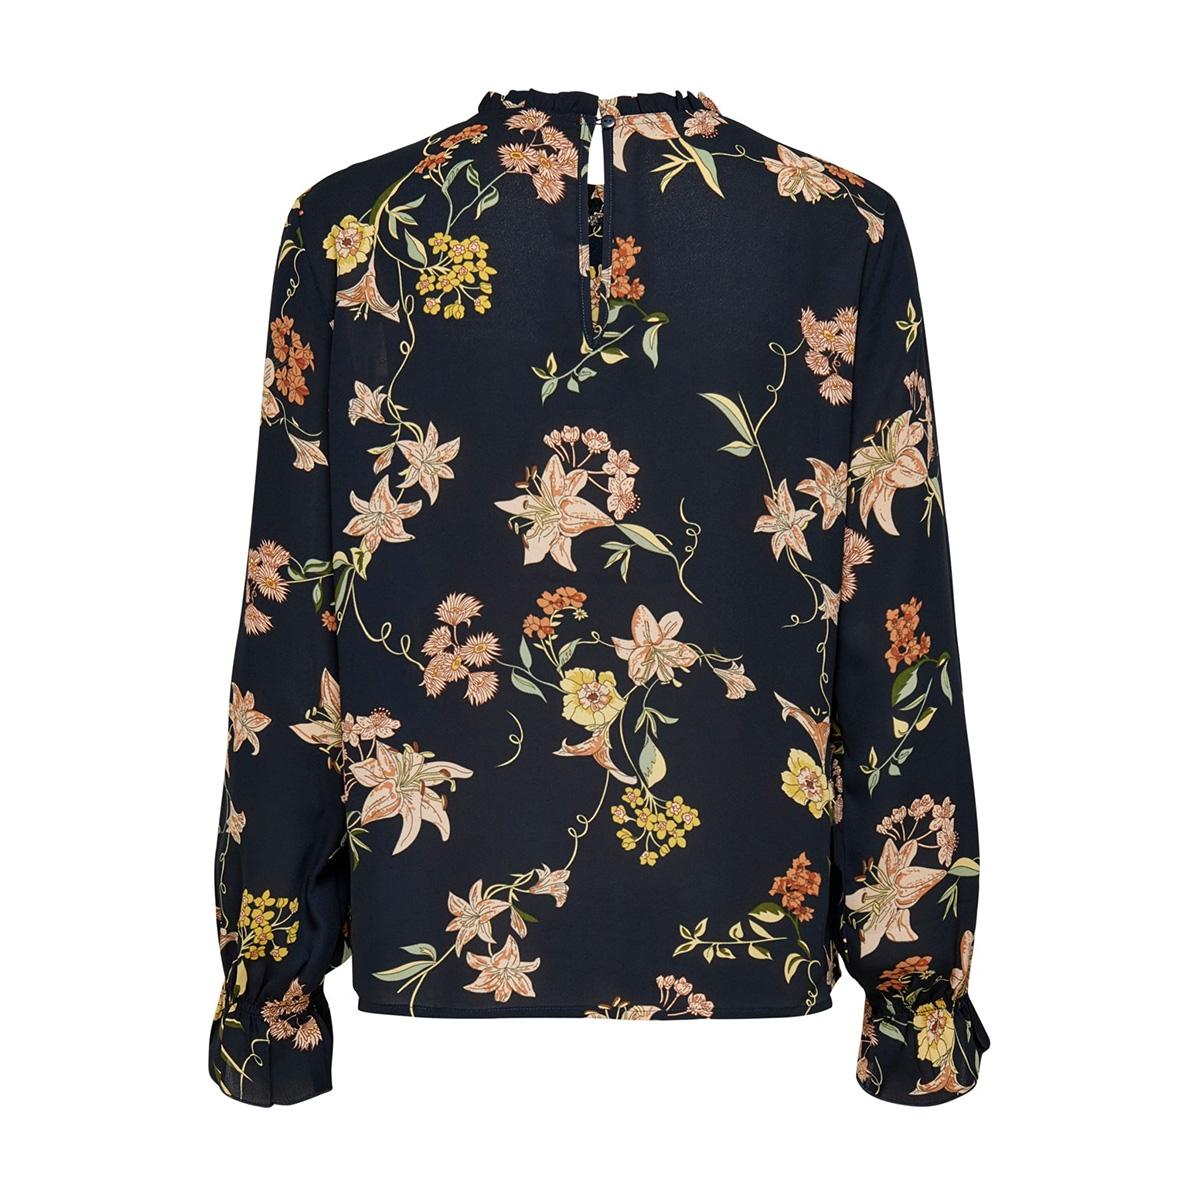 jdyjade l/s top wvn 15198847 jacqueline de yong blouse navy blazer/floral